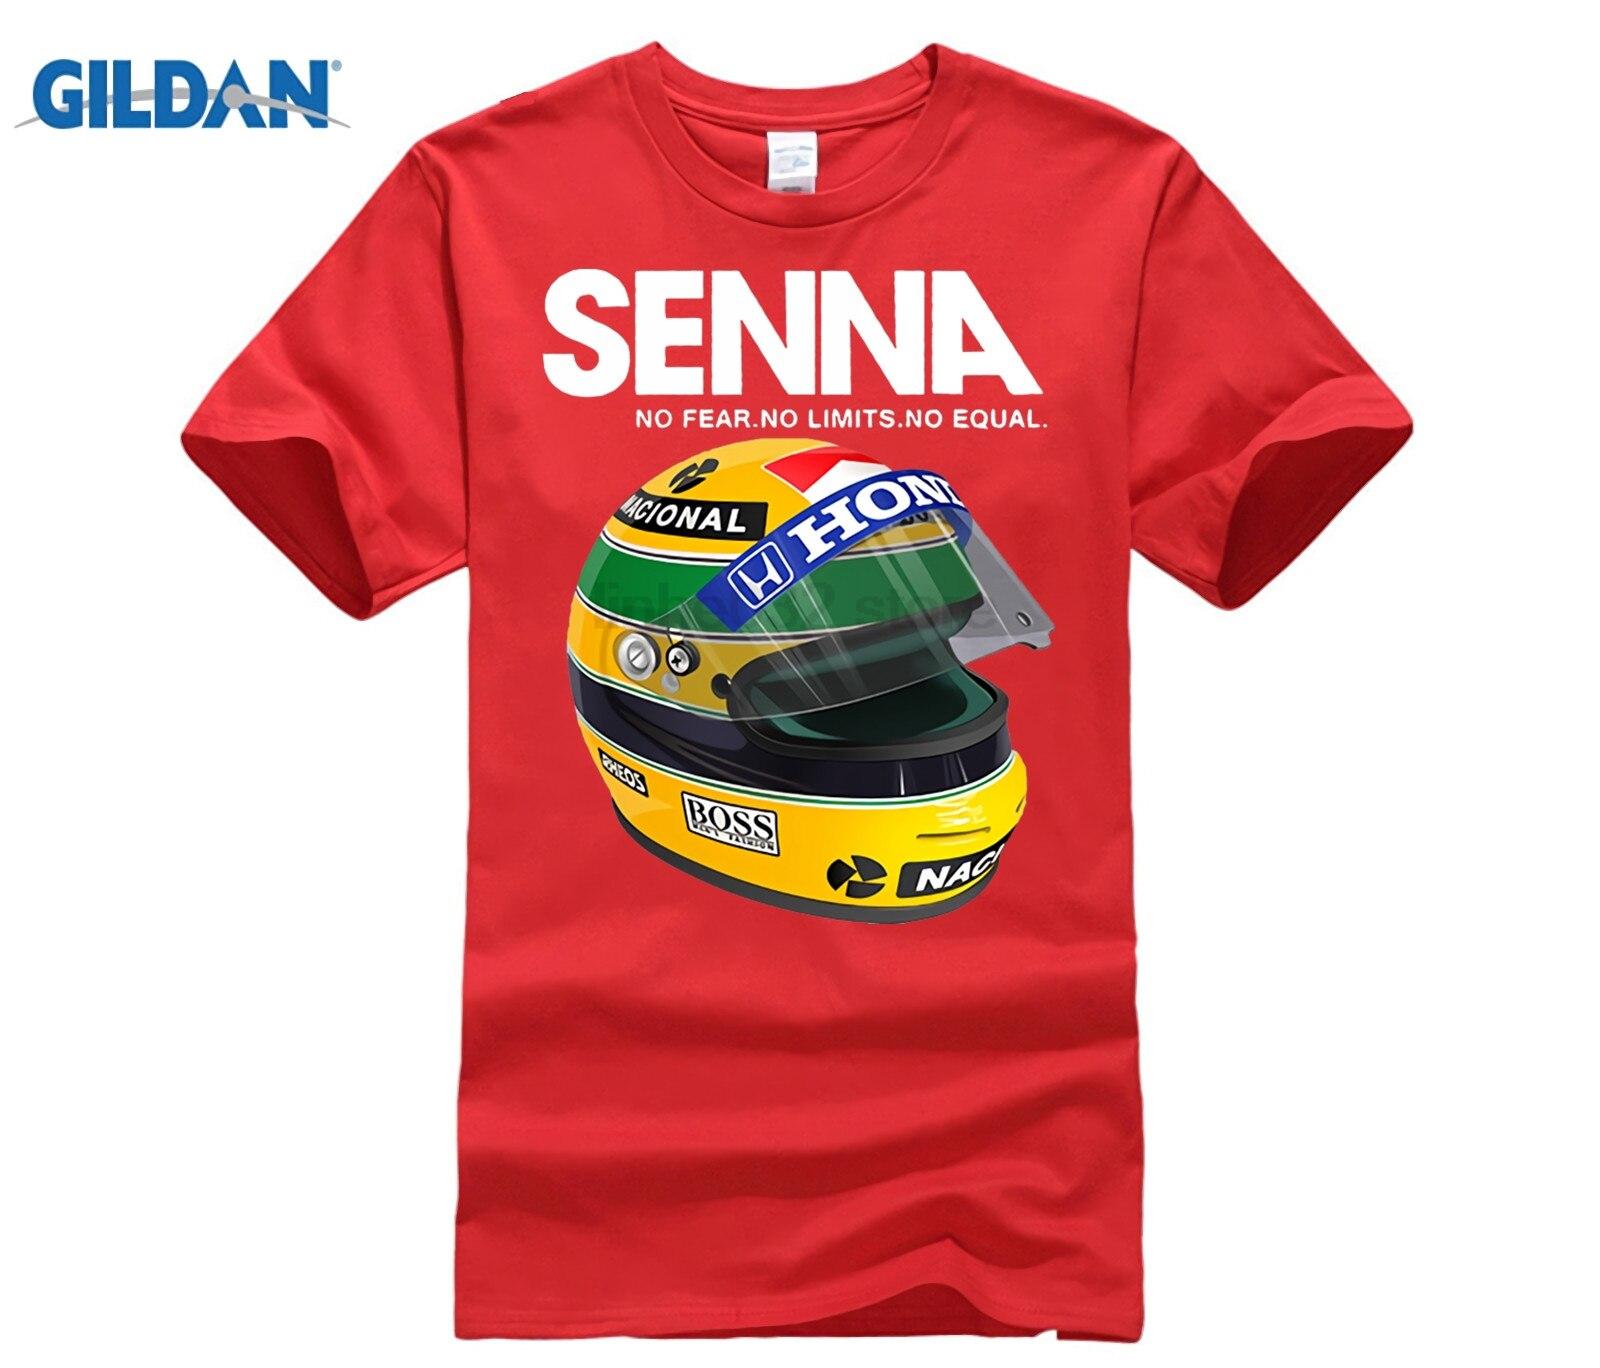 gildan-ayrton-font-b-senna-b-font-helmet-tee-tops-clothing-1-race-car-man-crew-neck-short-sleeve-t-shirt-popular-man-big-size-t-shirt